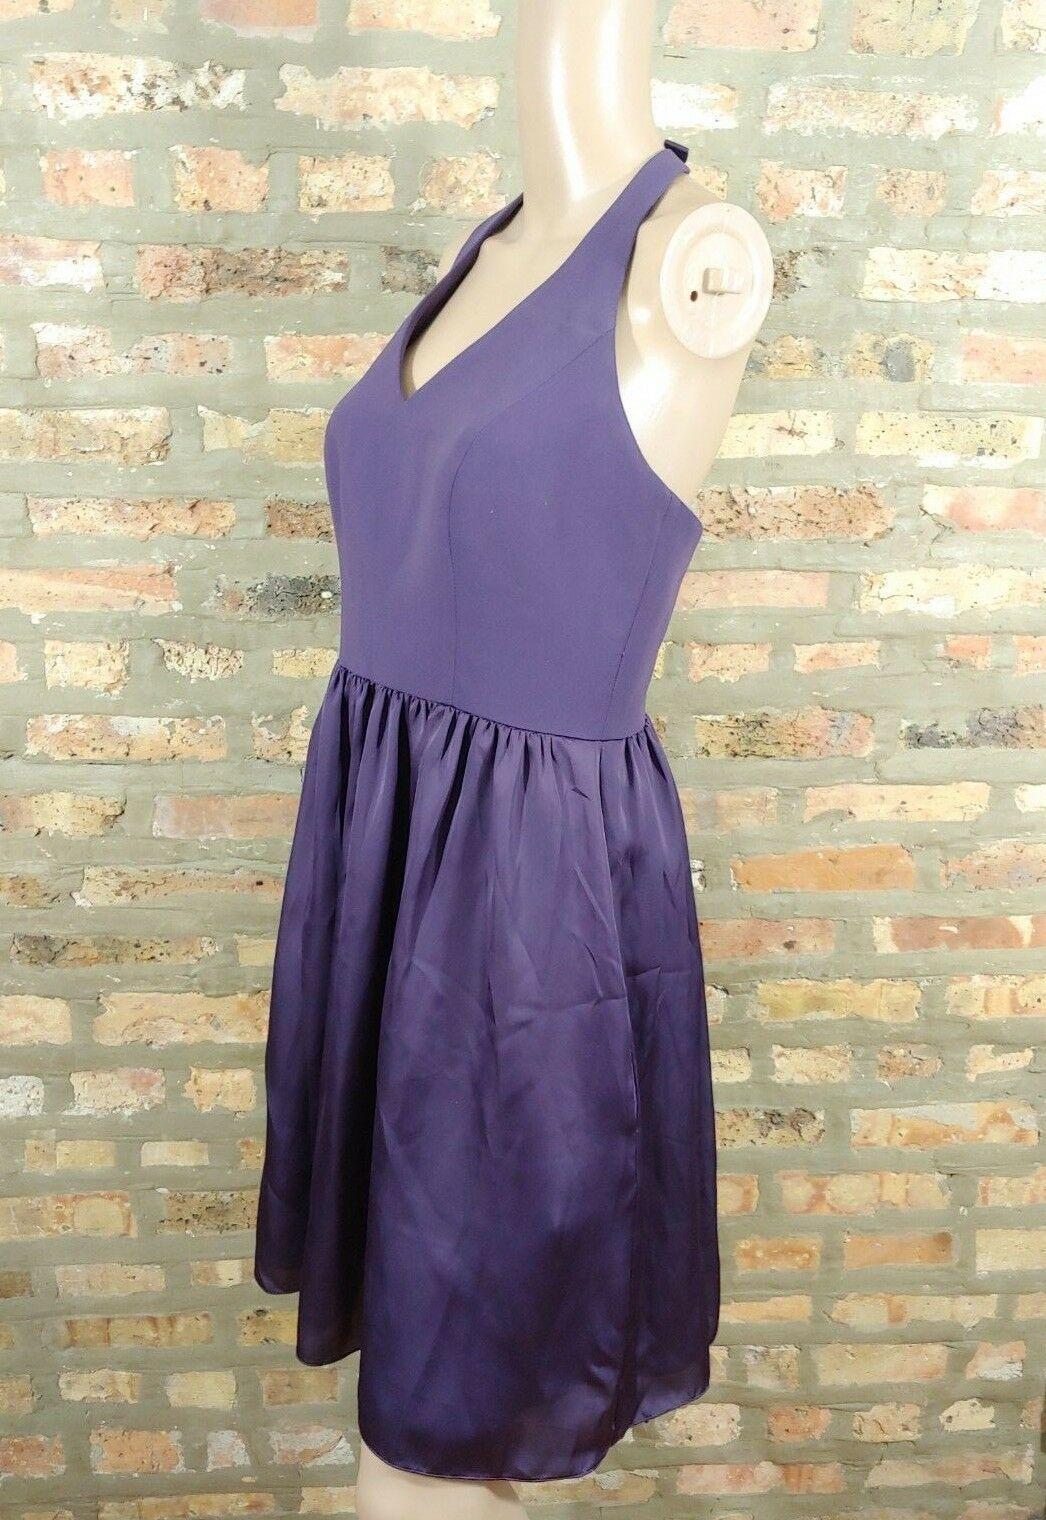 WHITE By Vera Wang Amethyst Purple V-neck Halter Fit & Flare Bridesmaid Dress 6